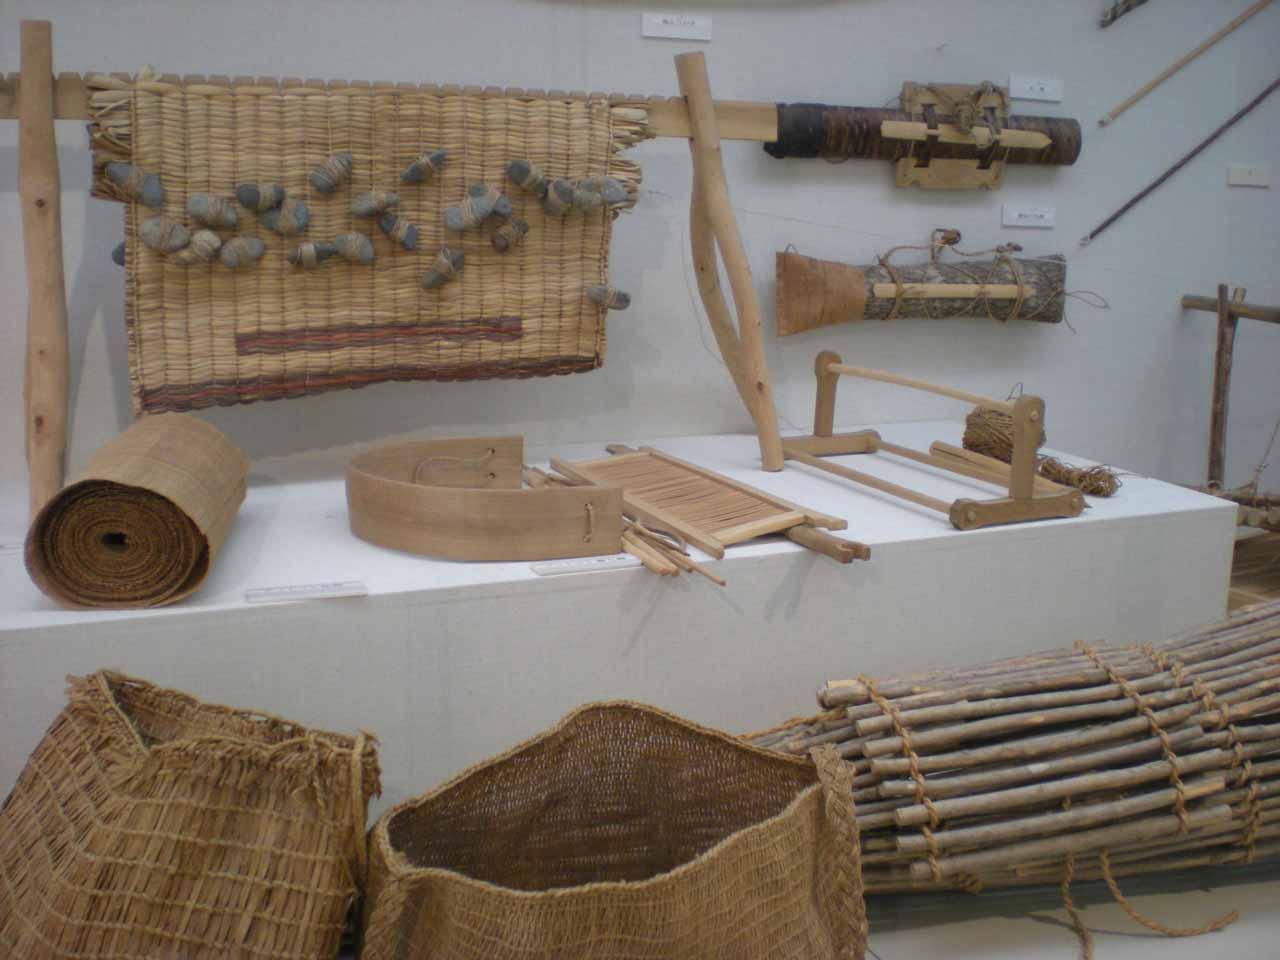 Ainu artifacts